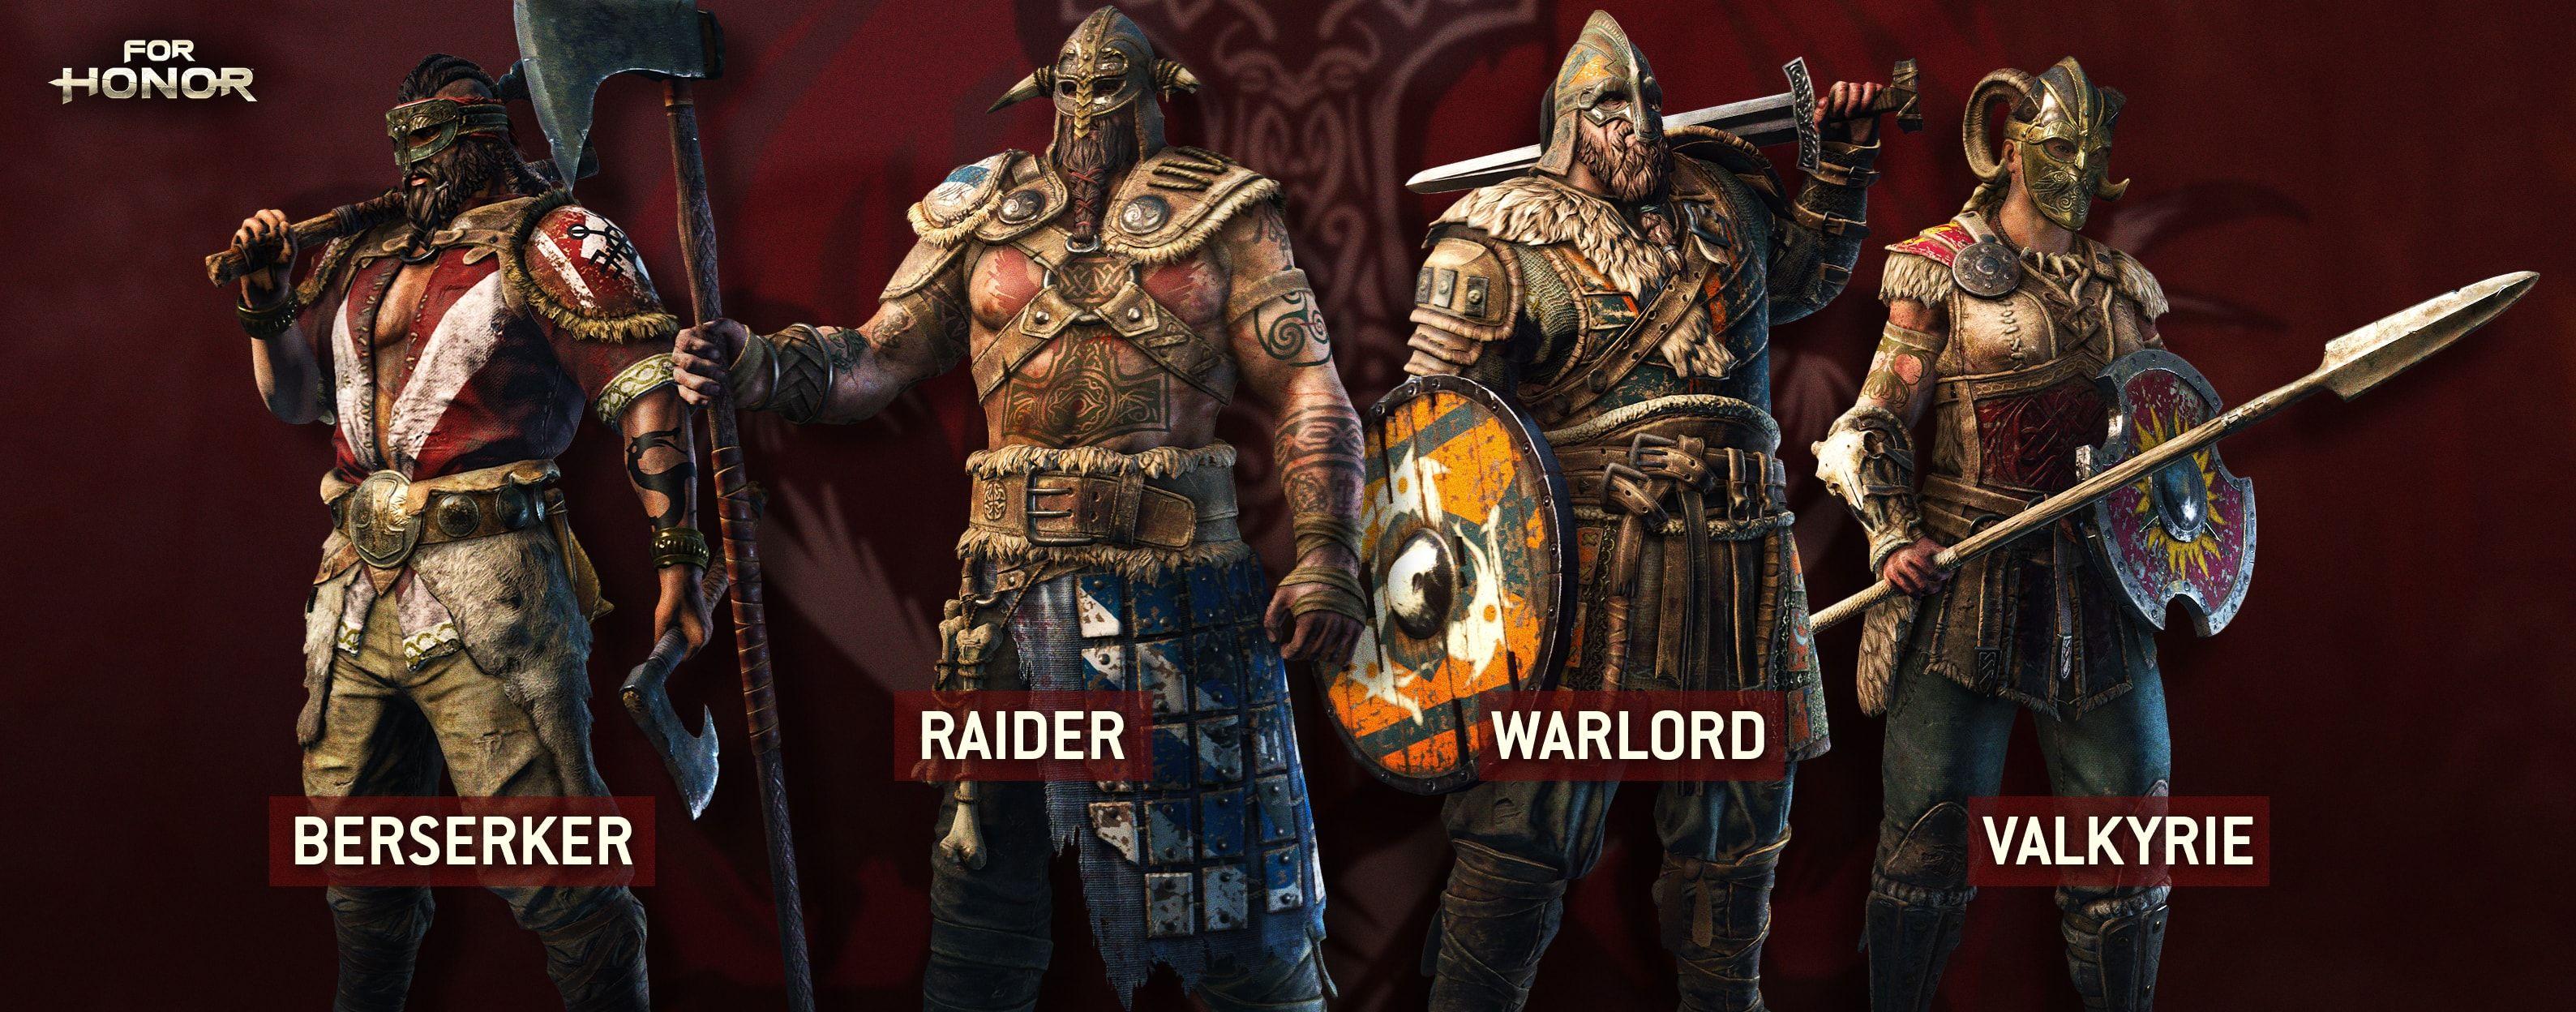 My Vikings | For Honor | Honor classes, For honor viking